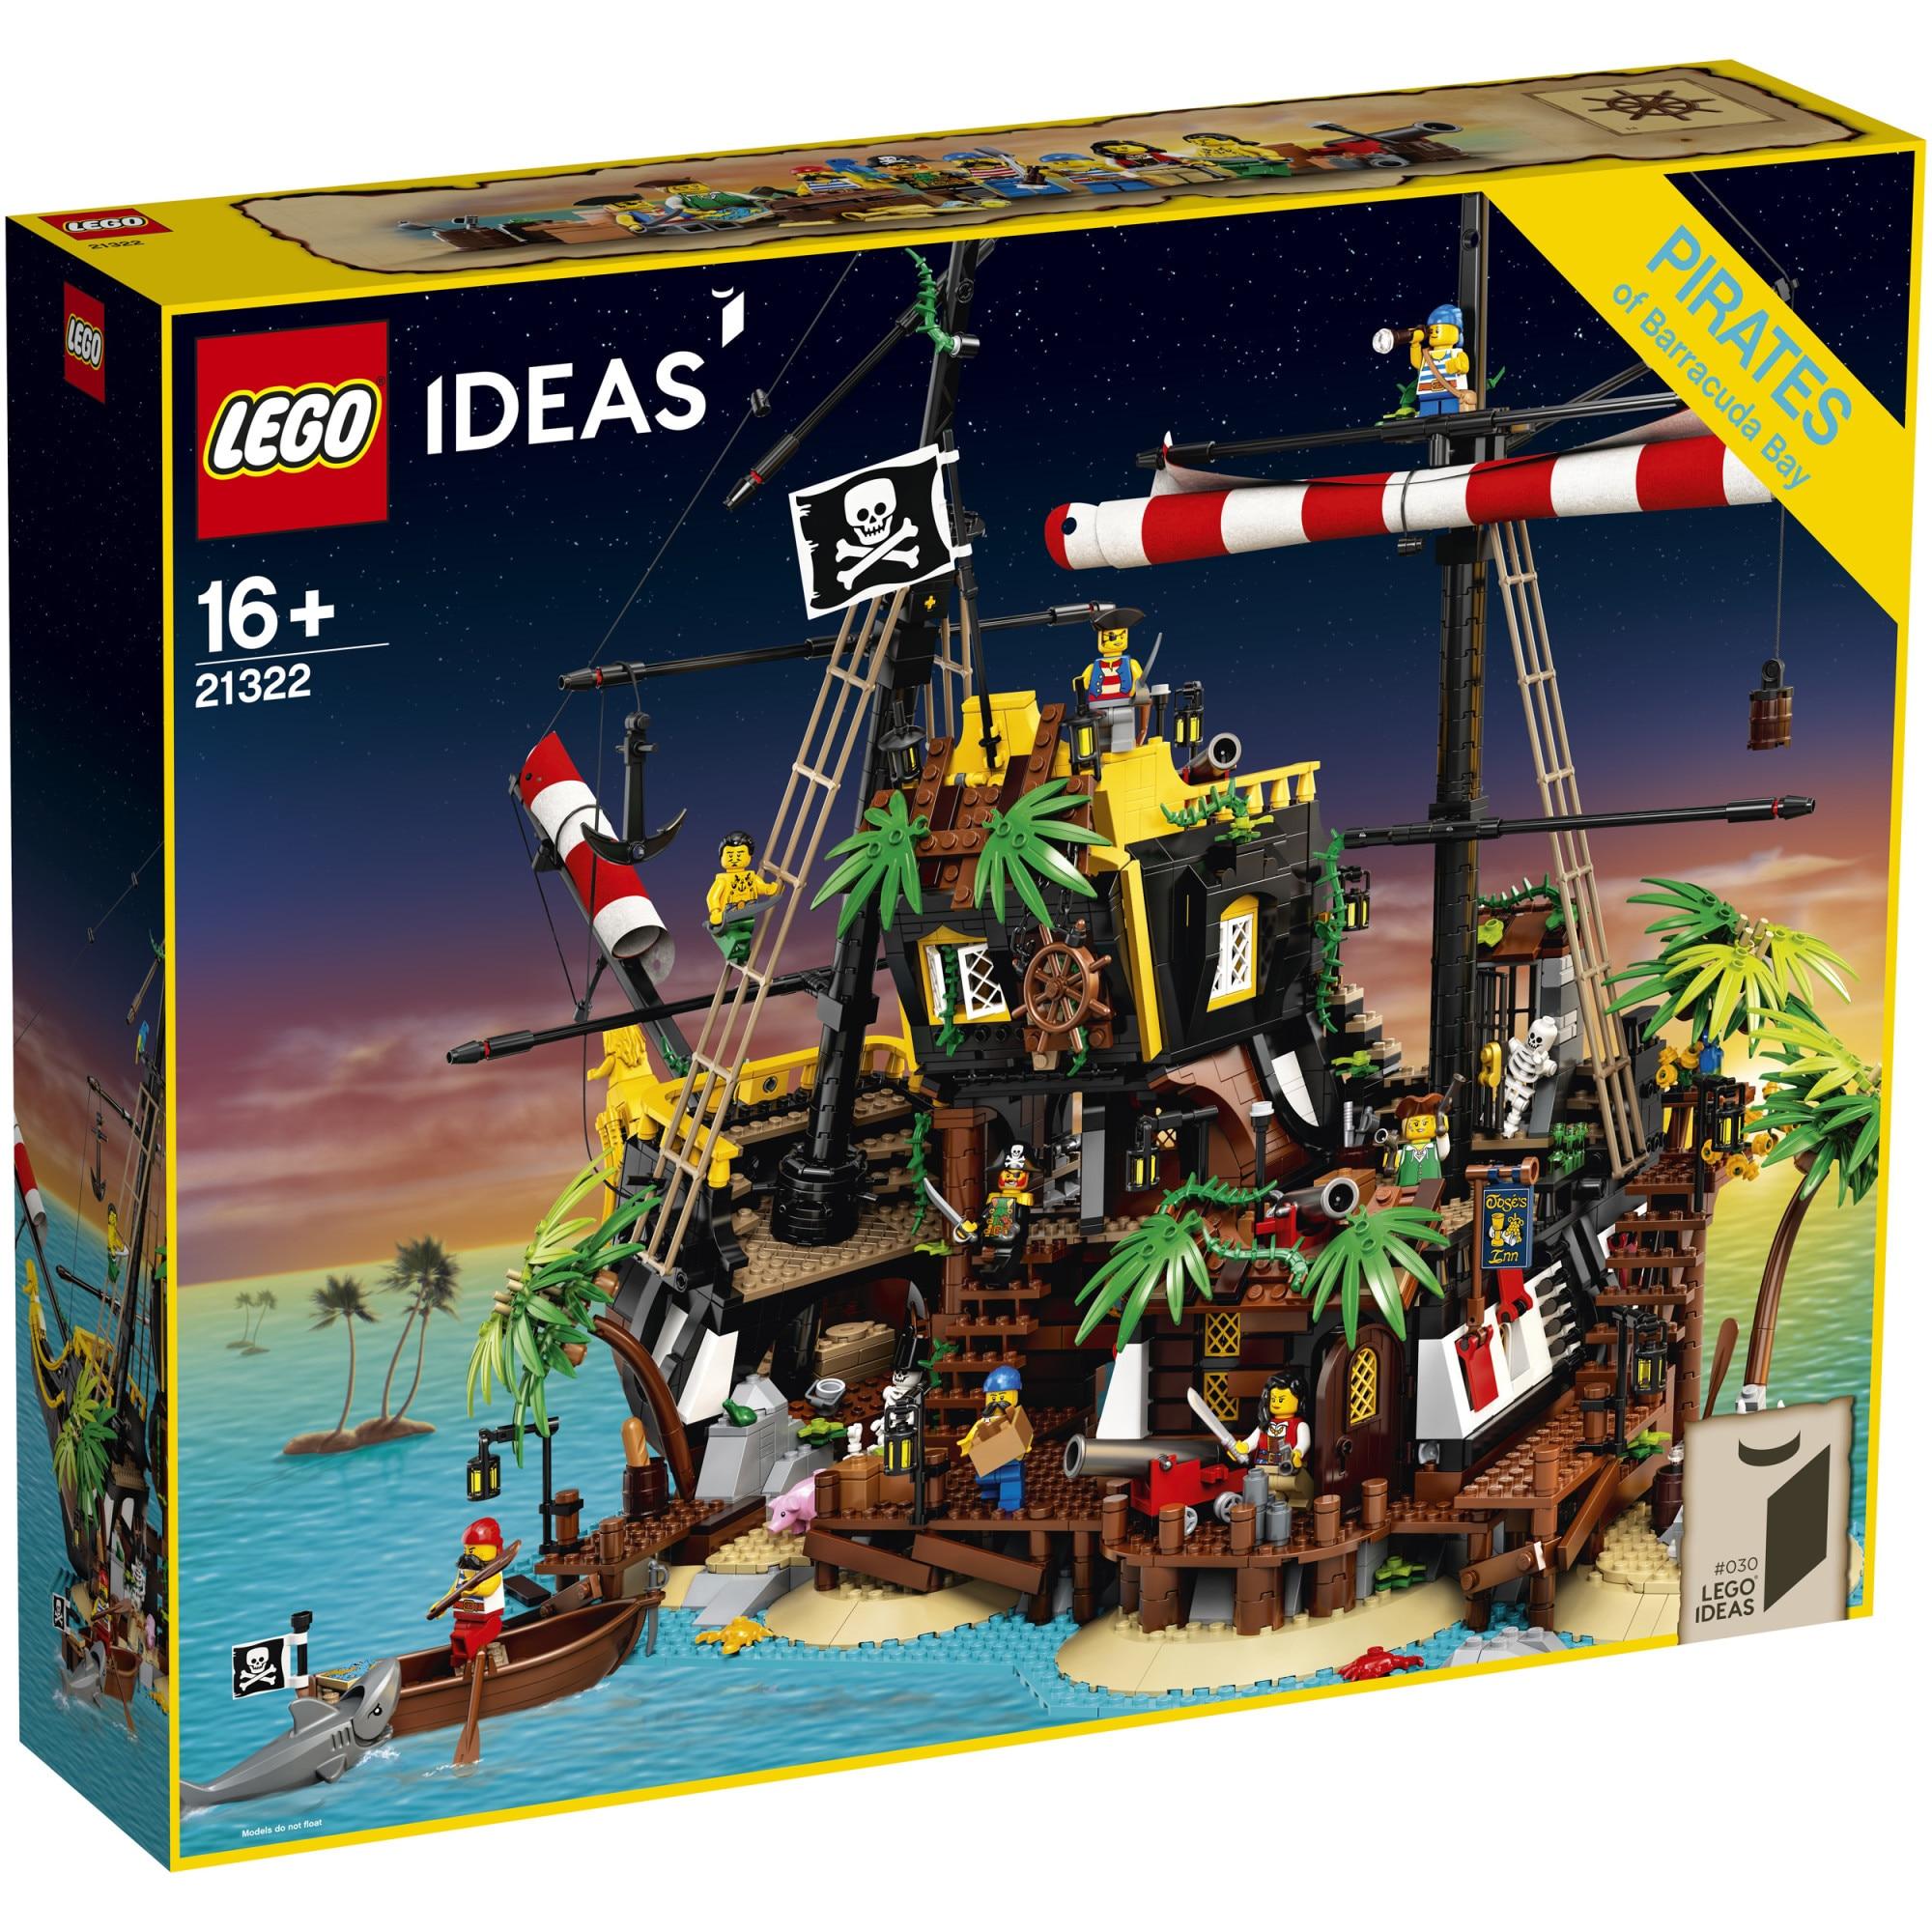 Fotografie LEGO Ideas - Piratii din golful Barracuda 21322, 2545 piese